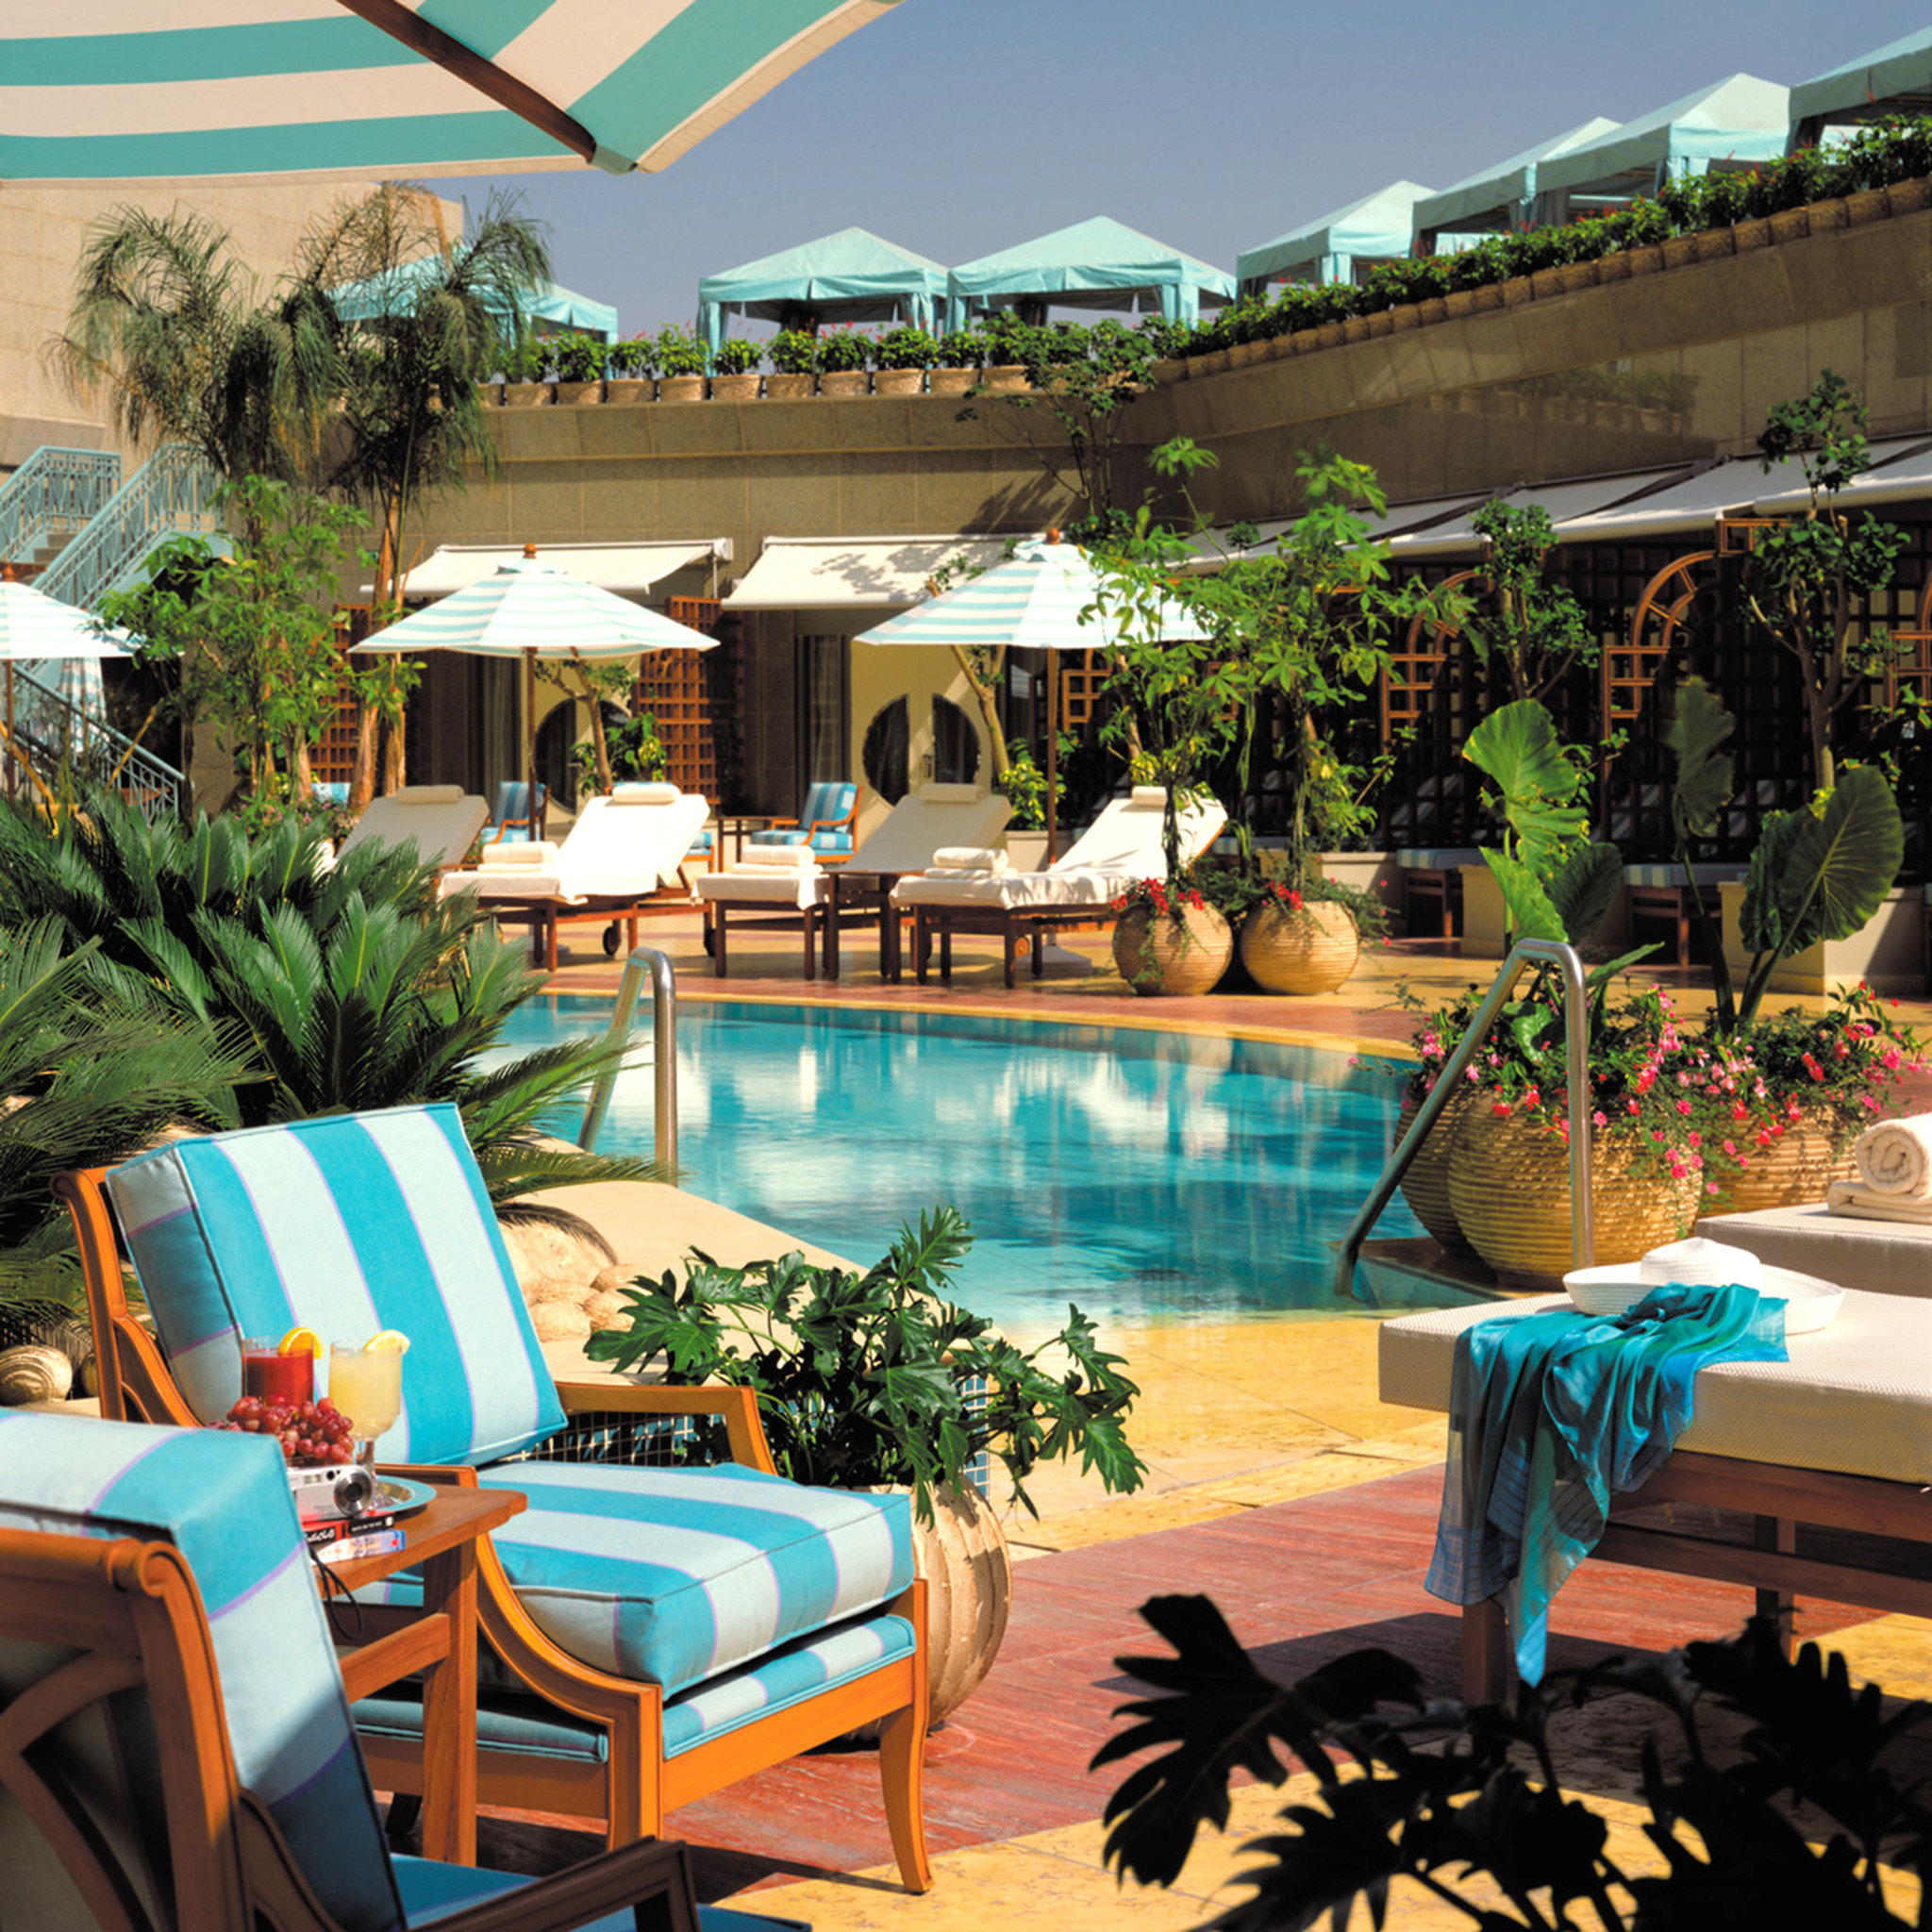 Seasons Plaza Hotel